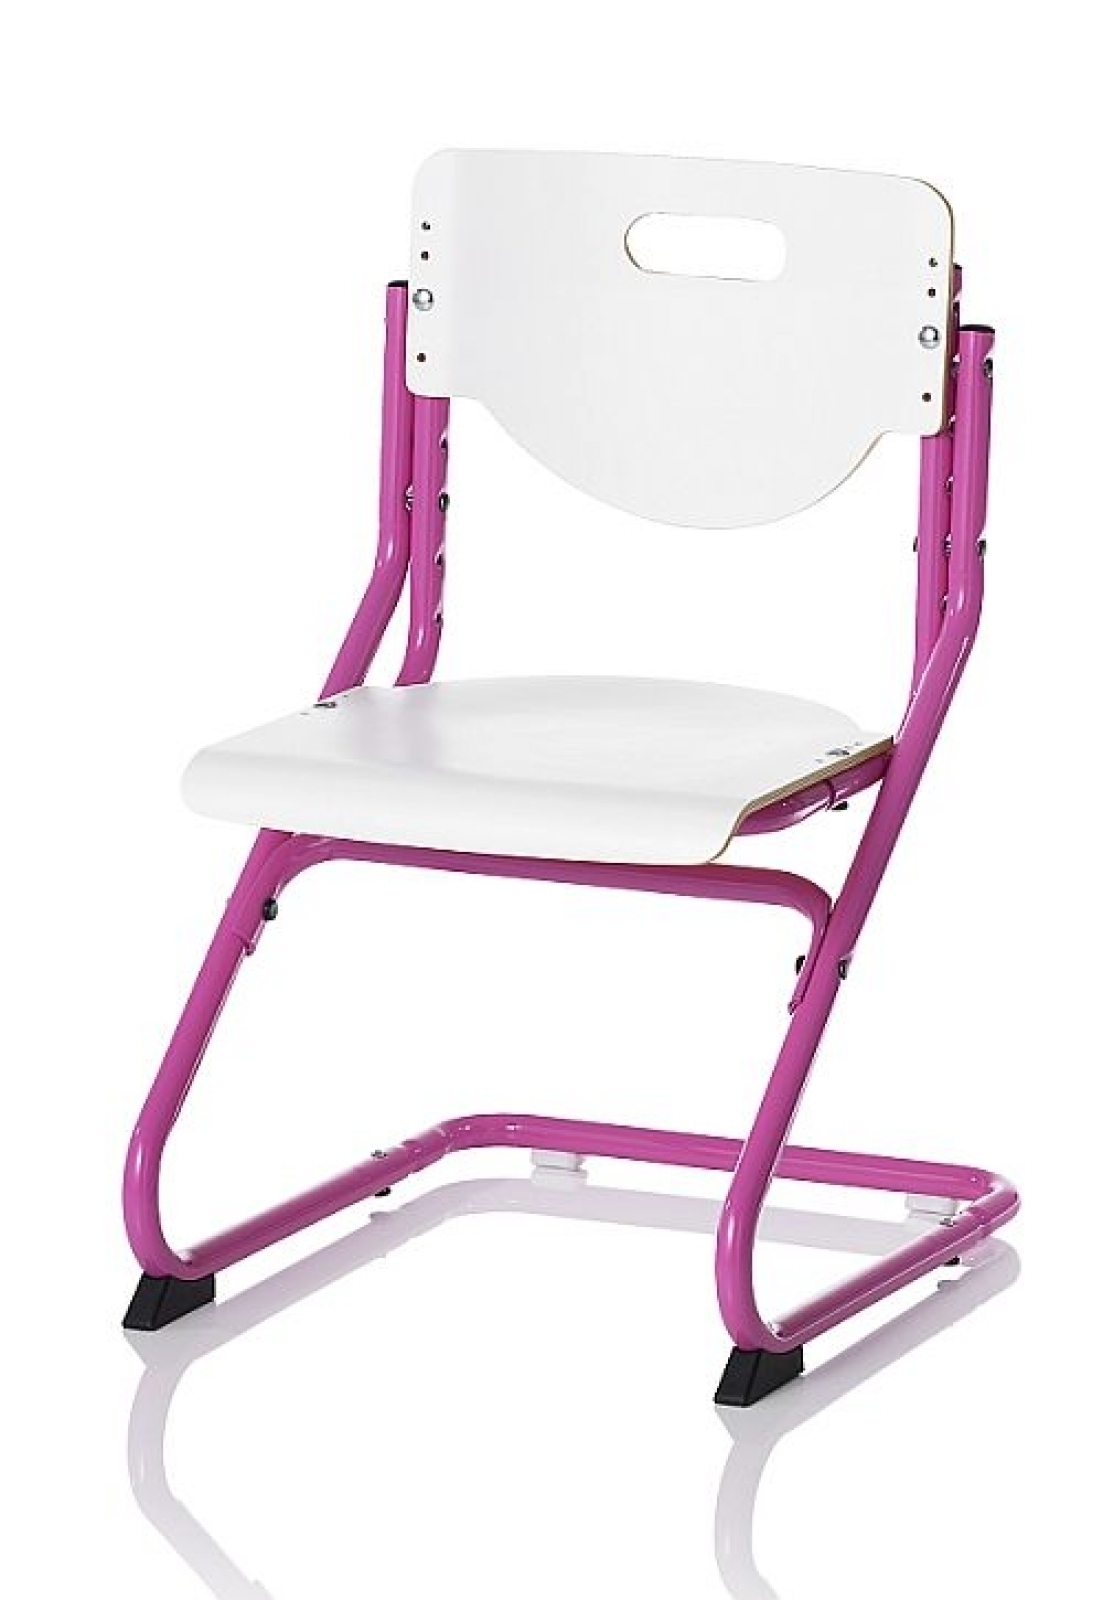 Pink Kinderstuhl White Kettler Plus Chair Weiß j4R5AL